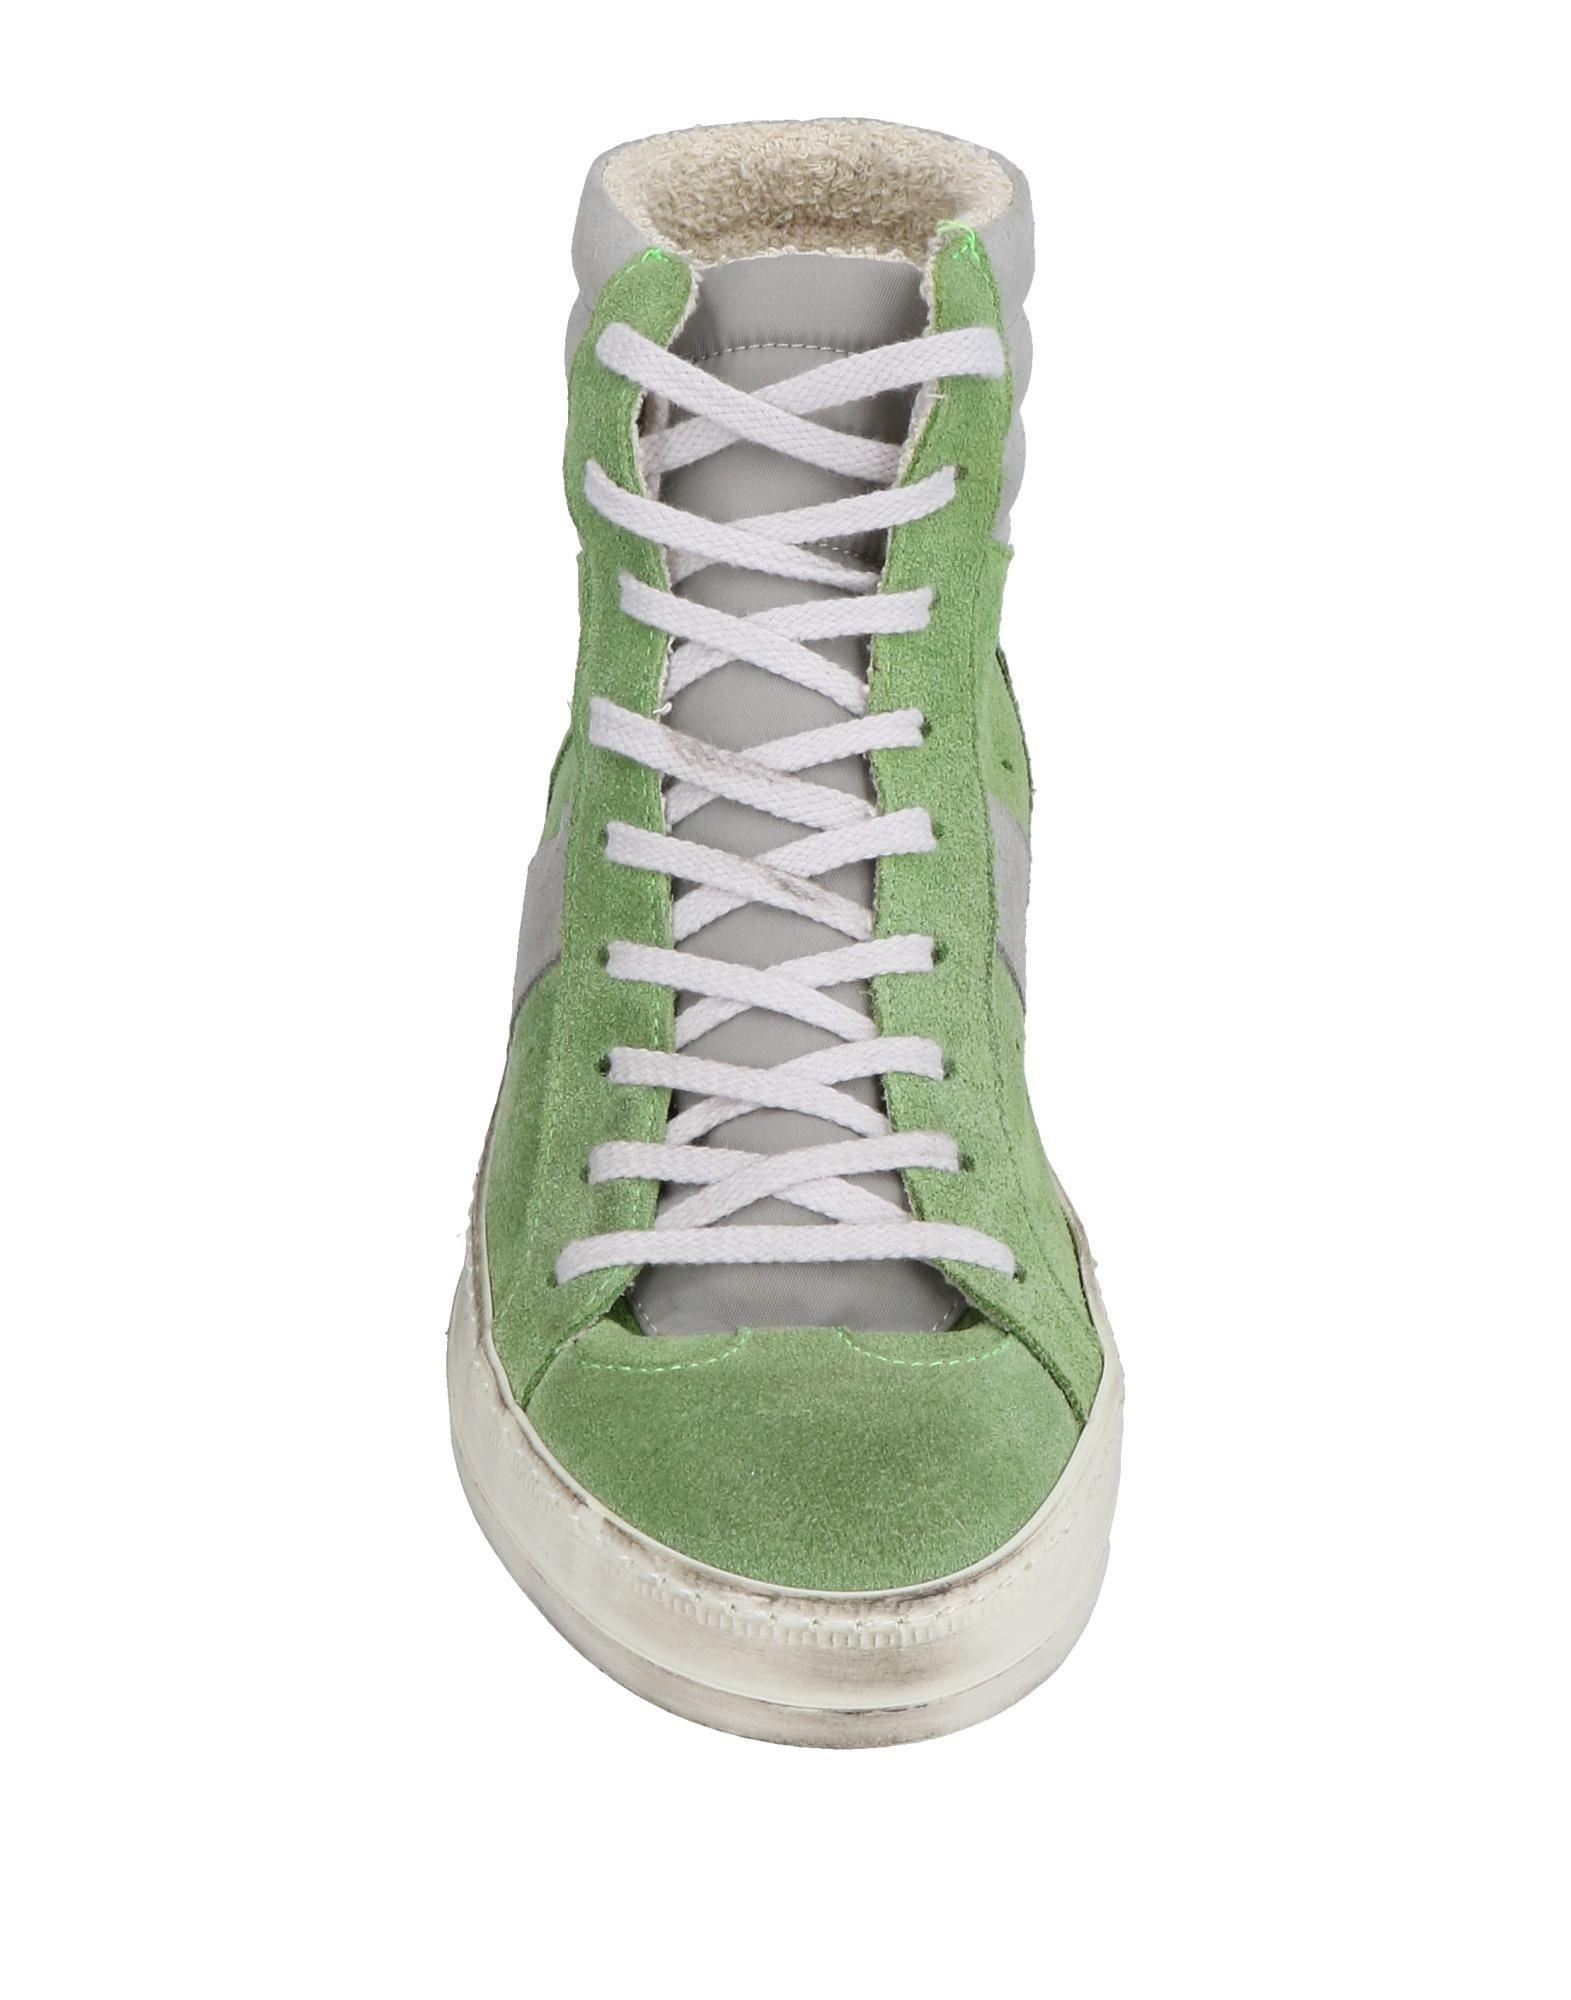 Patrizia Pepe Sneakers Herren   11496872OI c9a29a